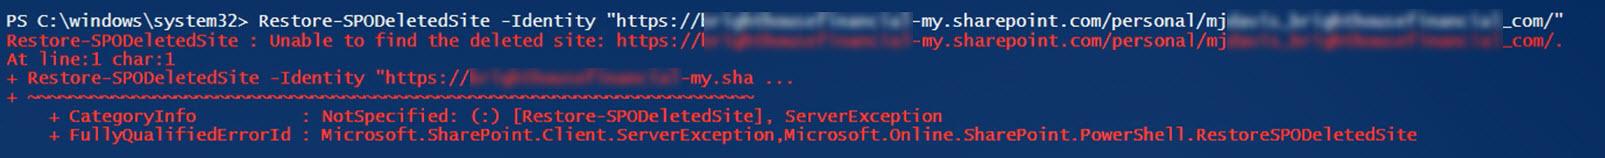 Restore deleted OneDrive error